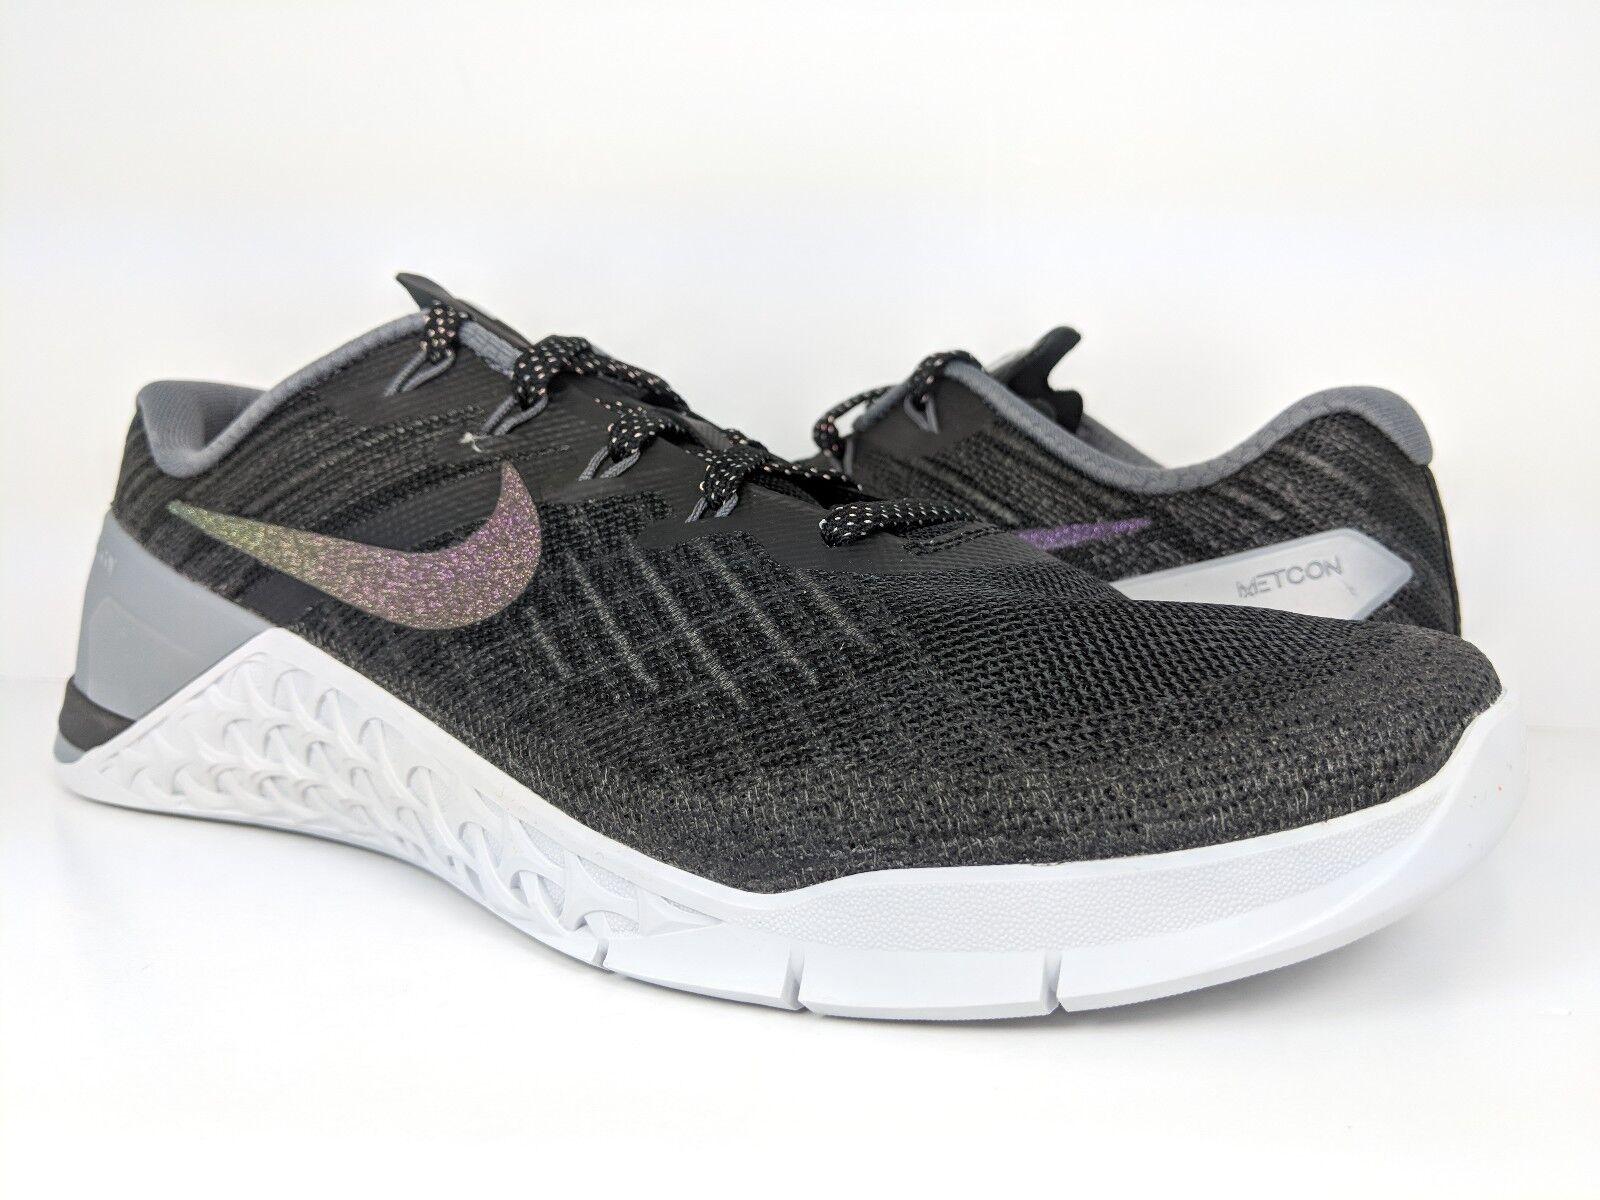 Nike Women's Metcon 3 Metallic Training Black Multi-color (922880-001) sz 10.5